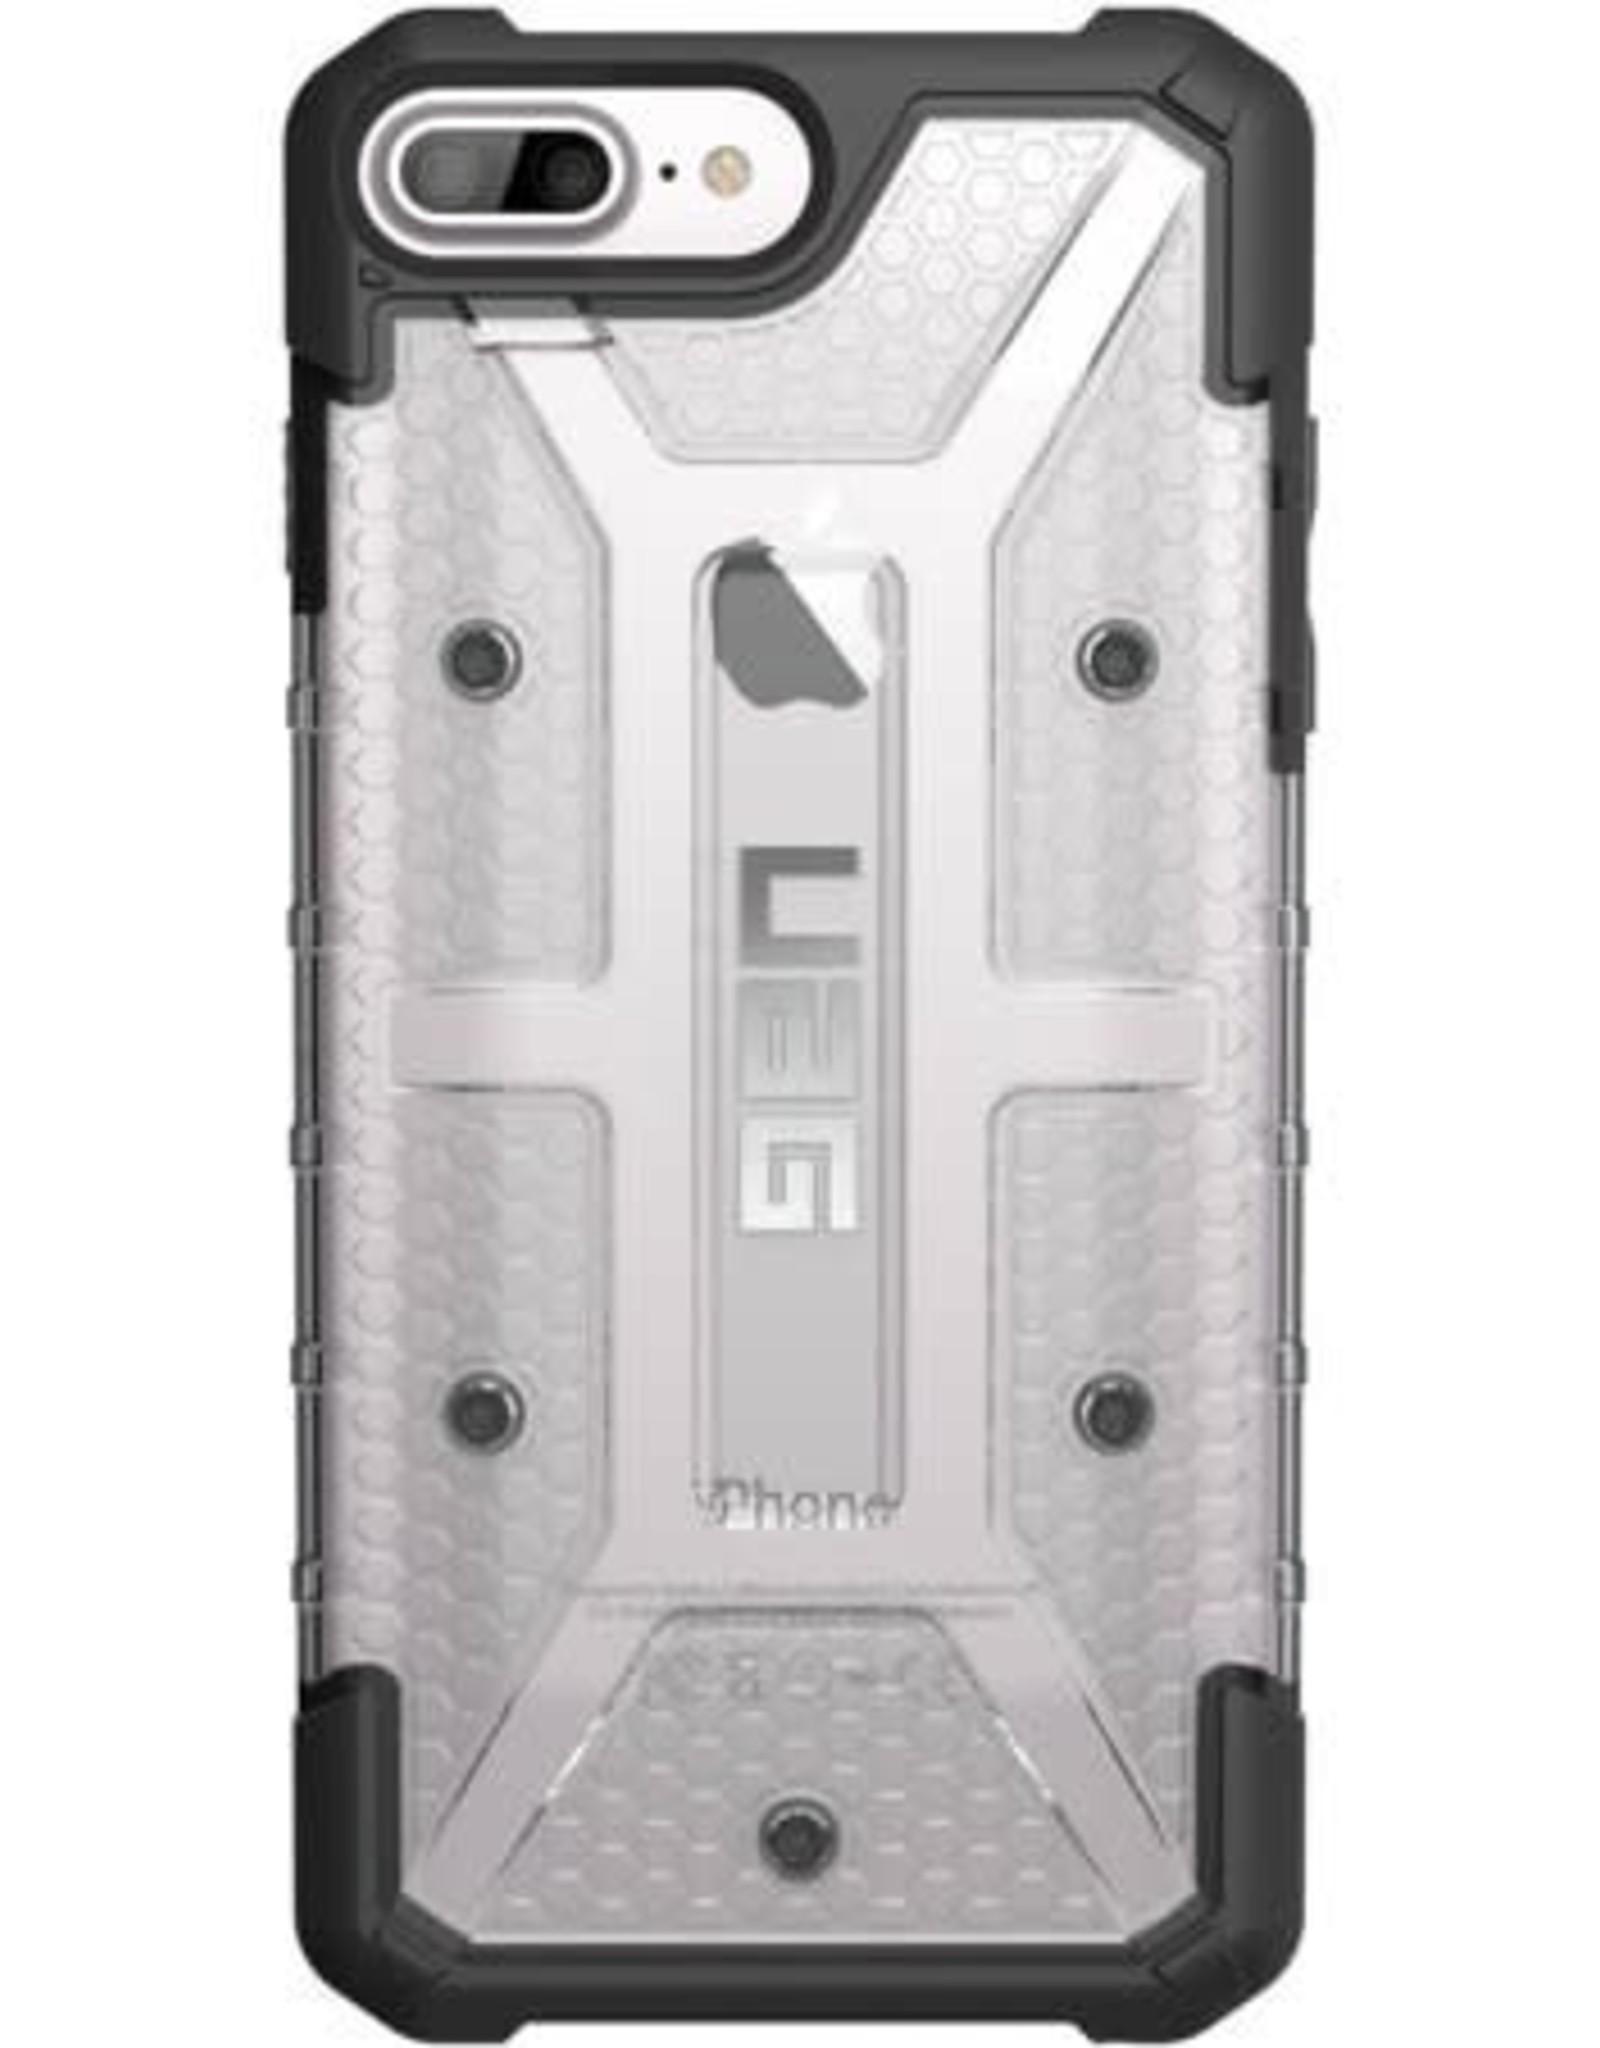 UAG /// UAG | iPhone 8/7/6/6s+ Ice/Black Plasma Series case | 15-01097